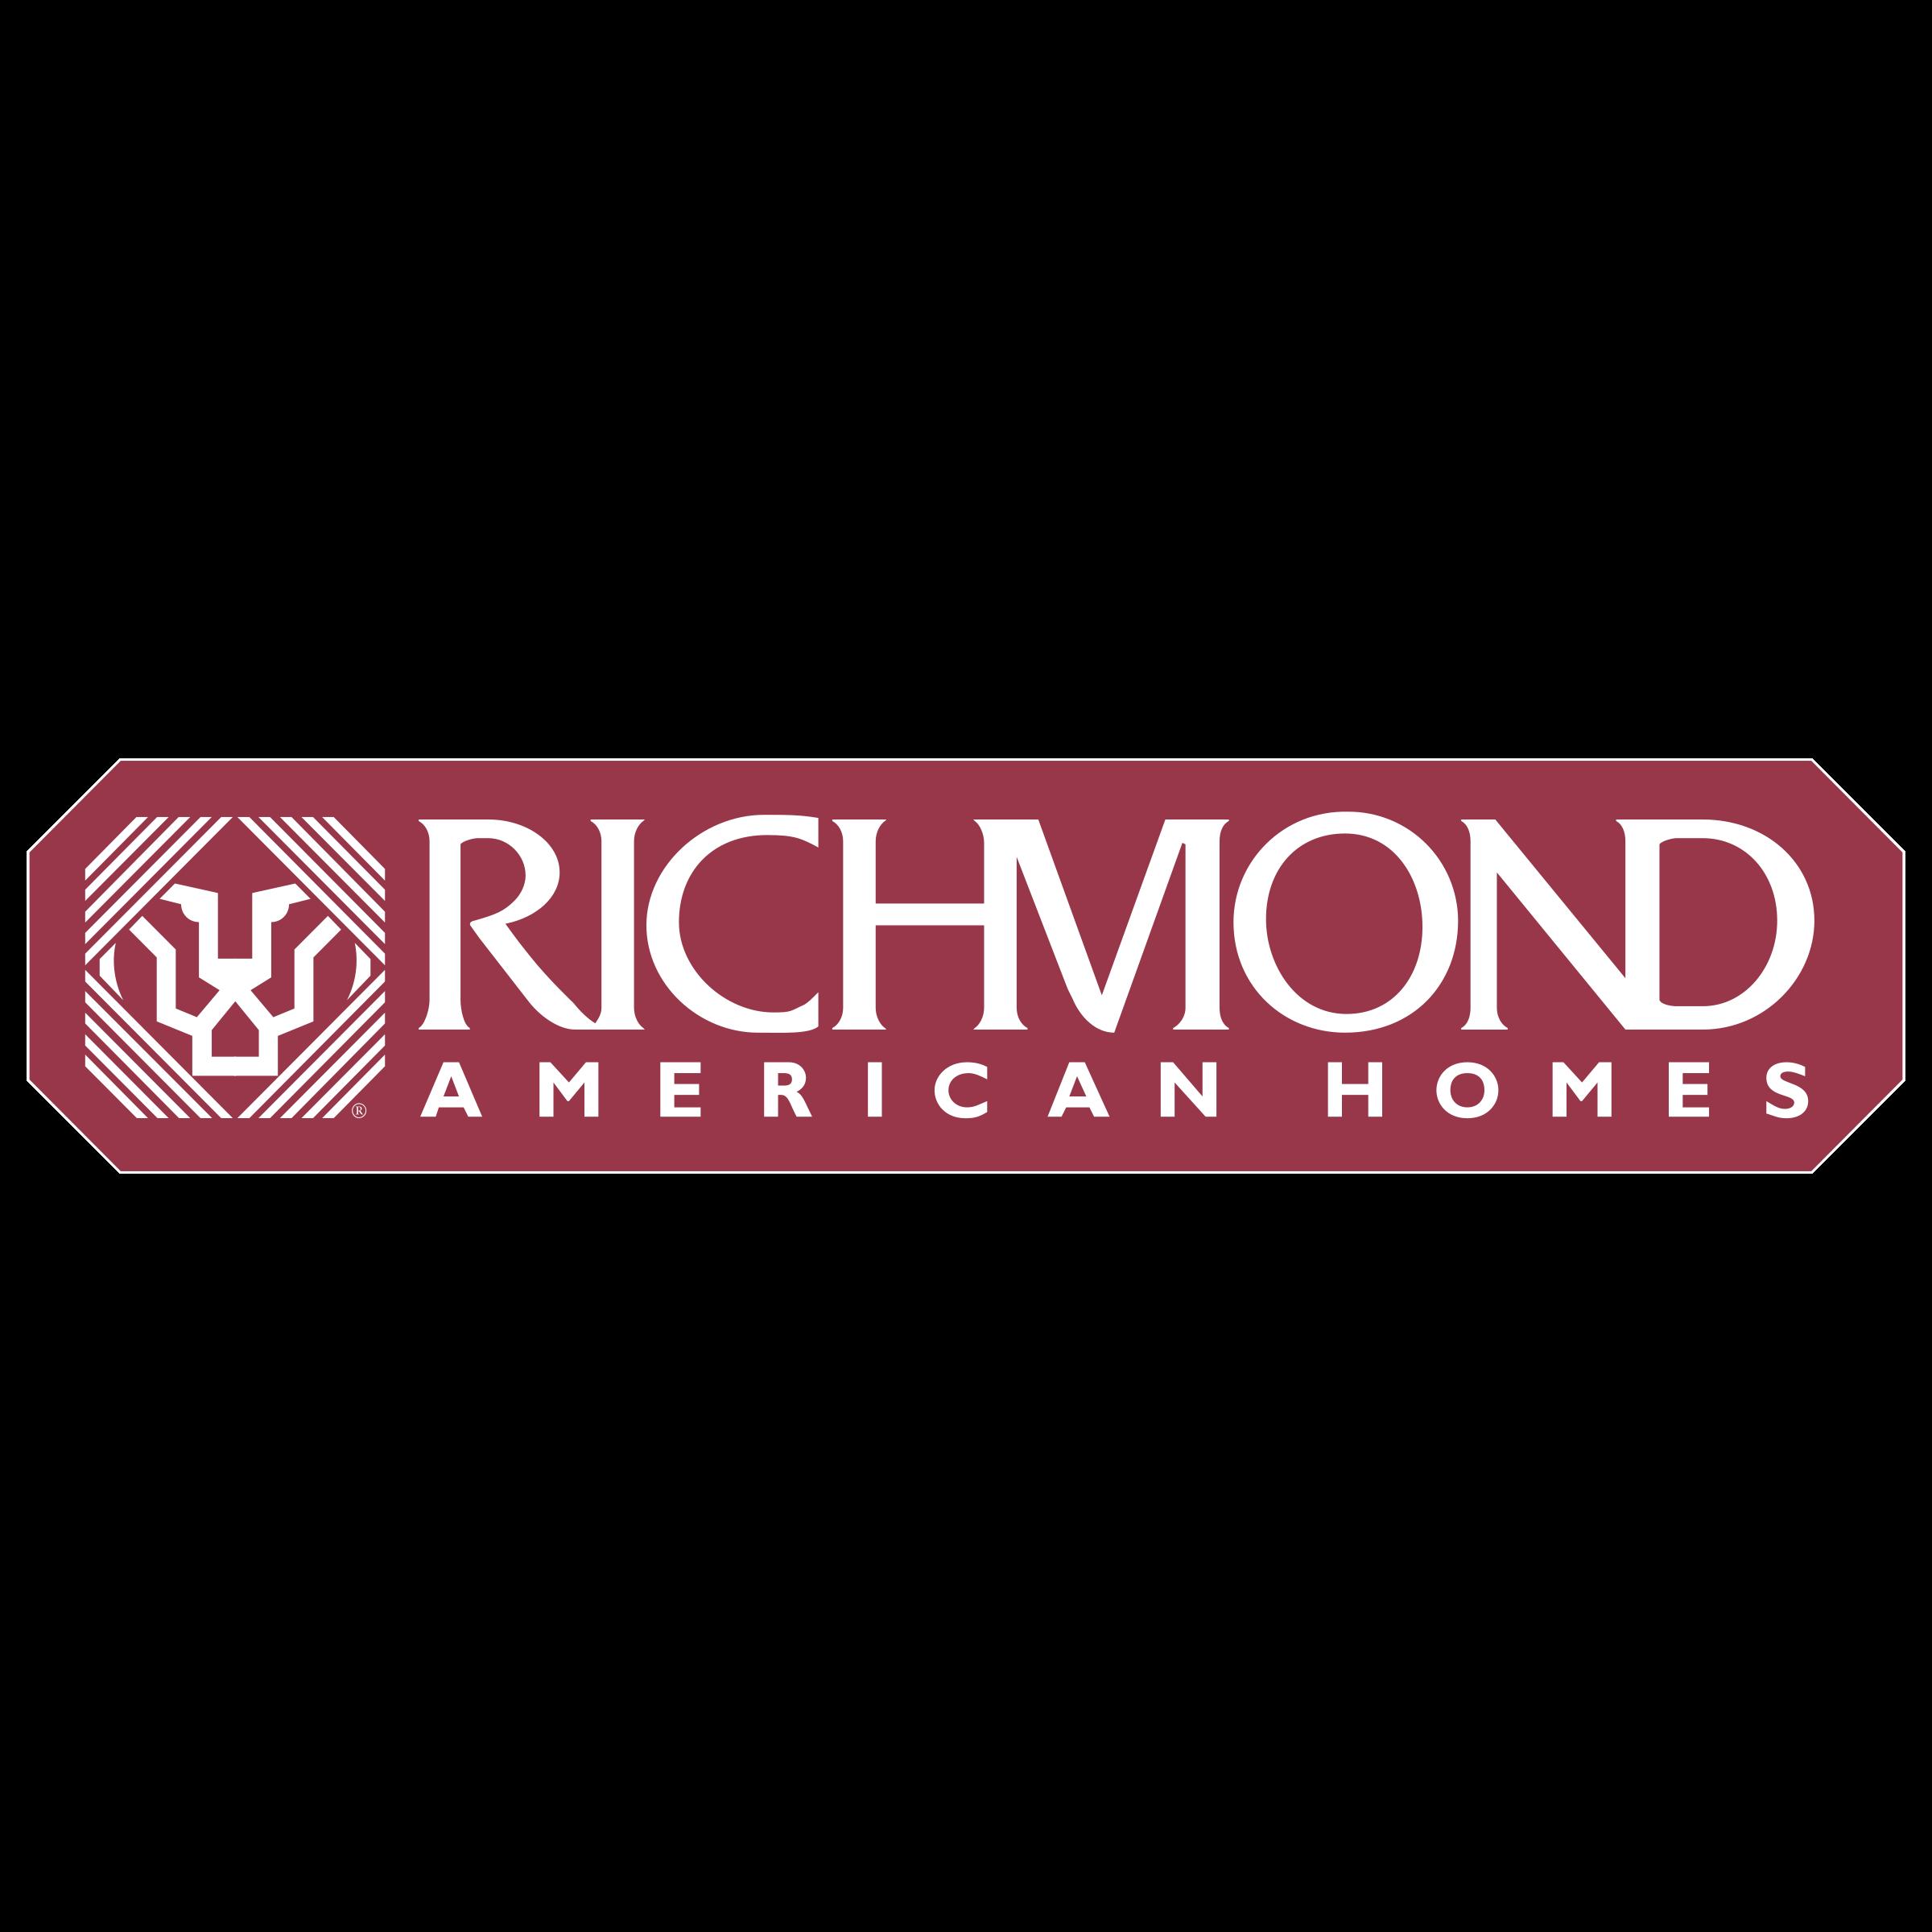 richmondamericanhomes.png